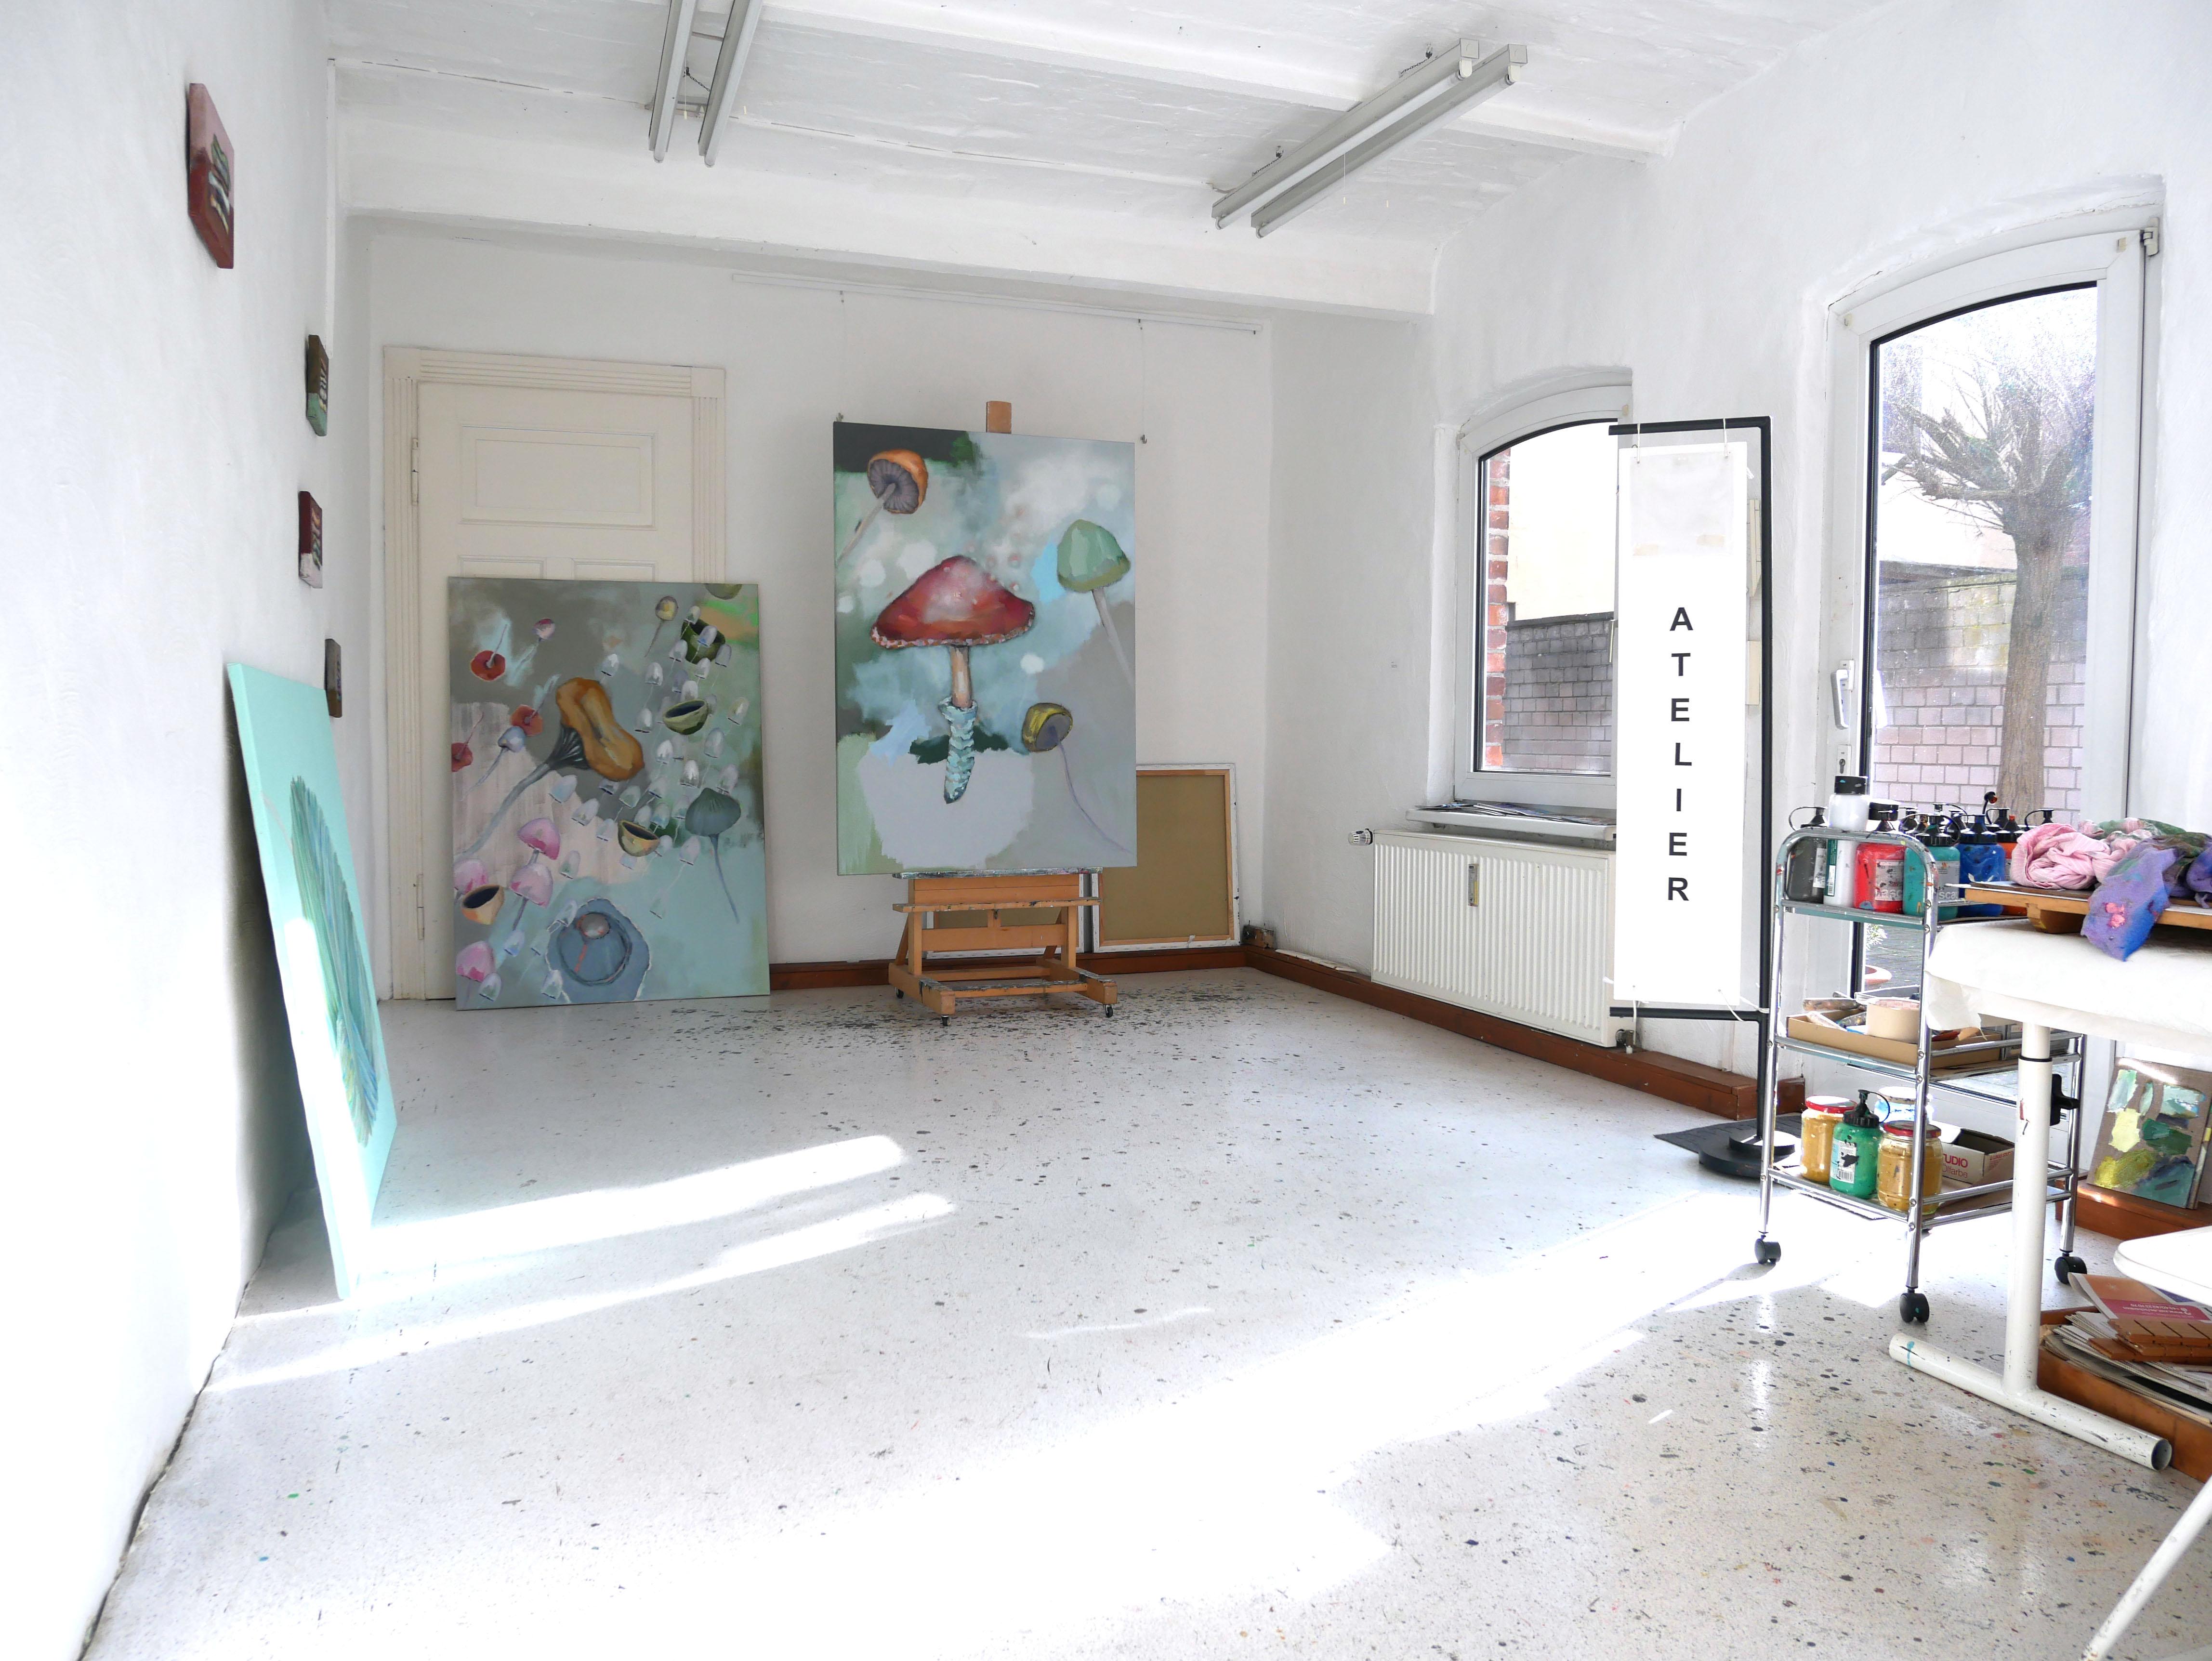 atelier innen ursula krämer.jpg